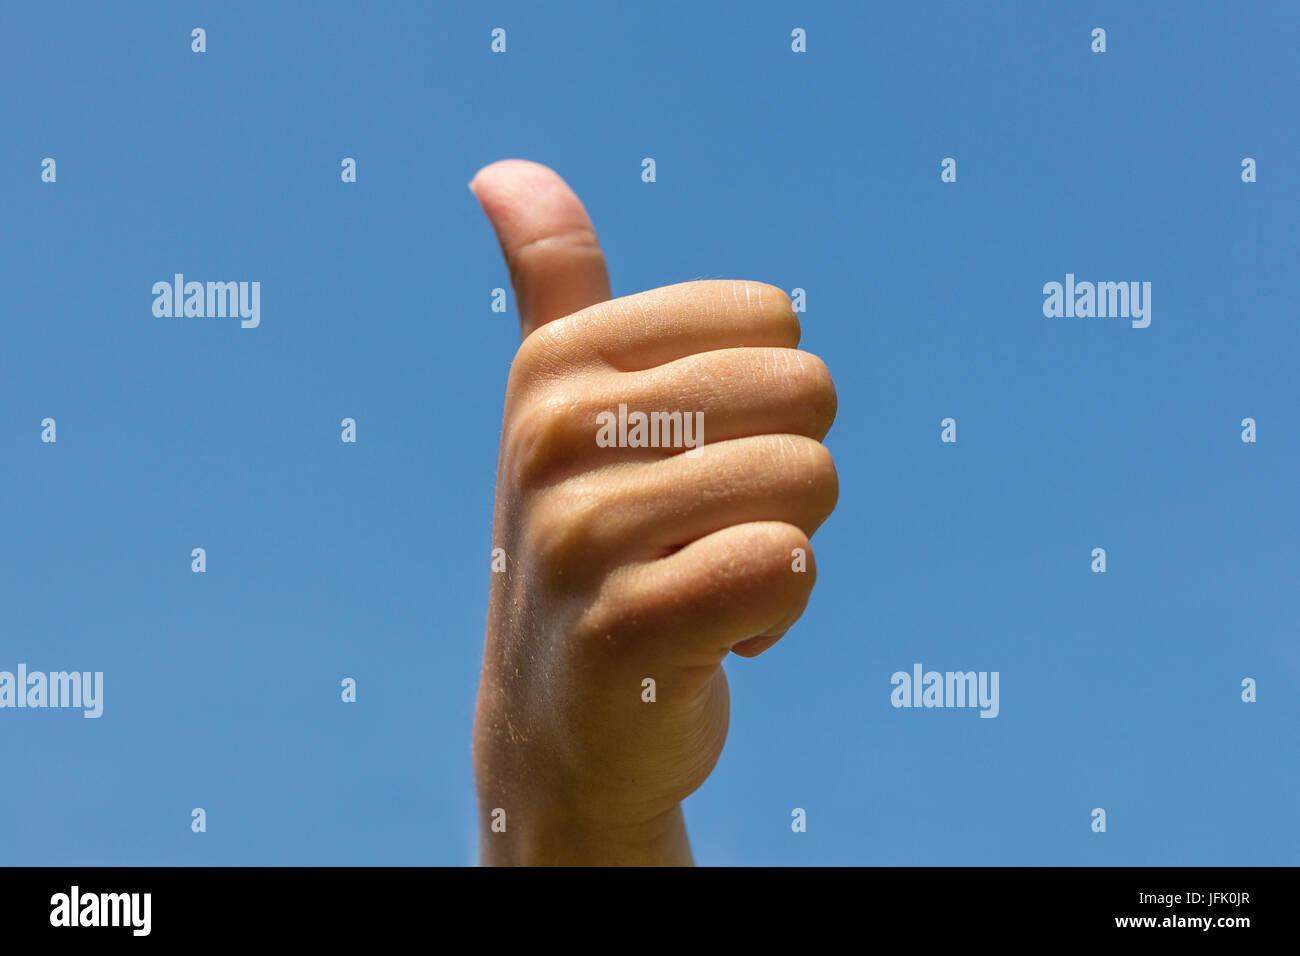 Thumbs up , mostrando la mano pulgar arriba Imagen De Stock